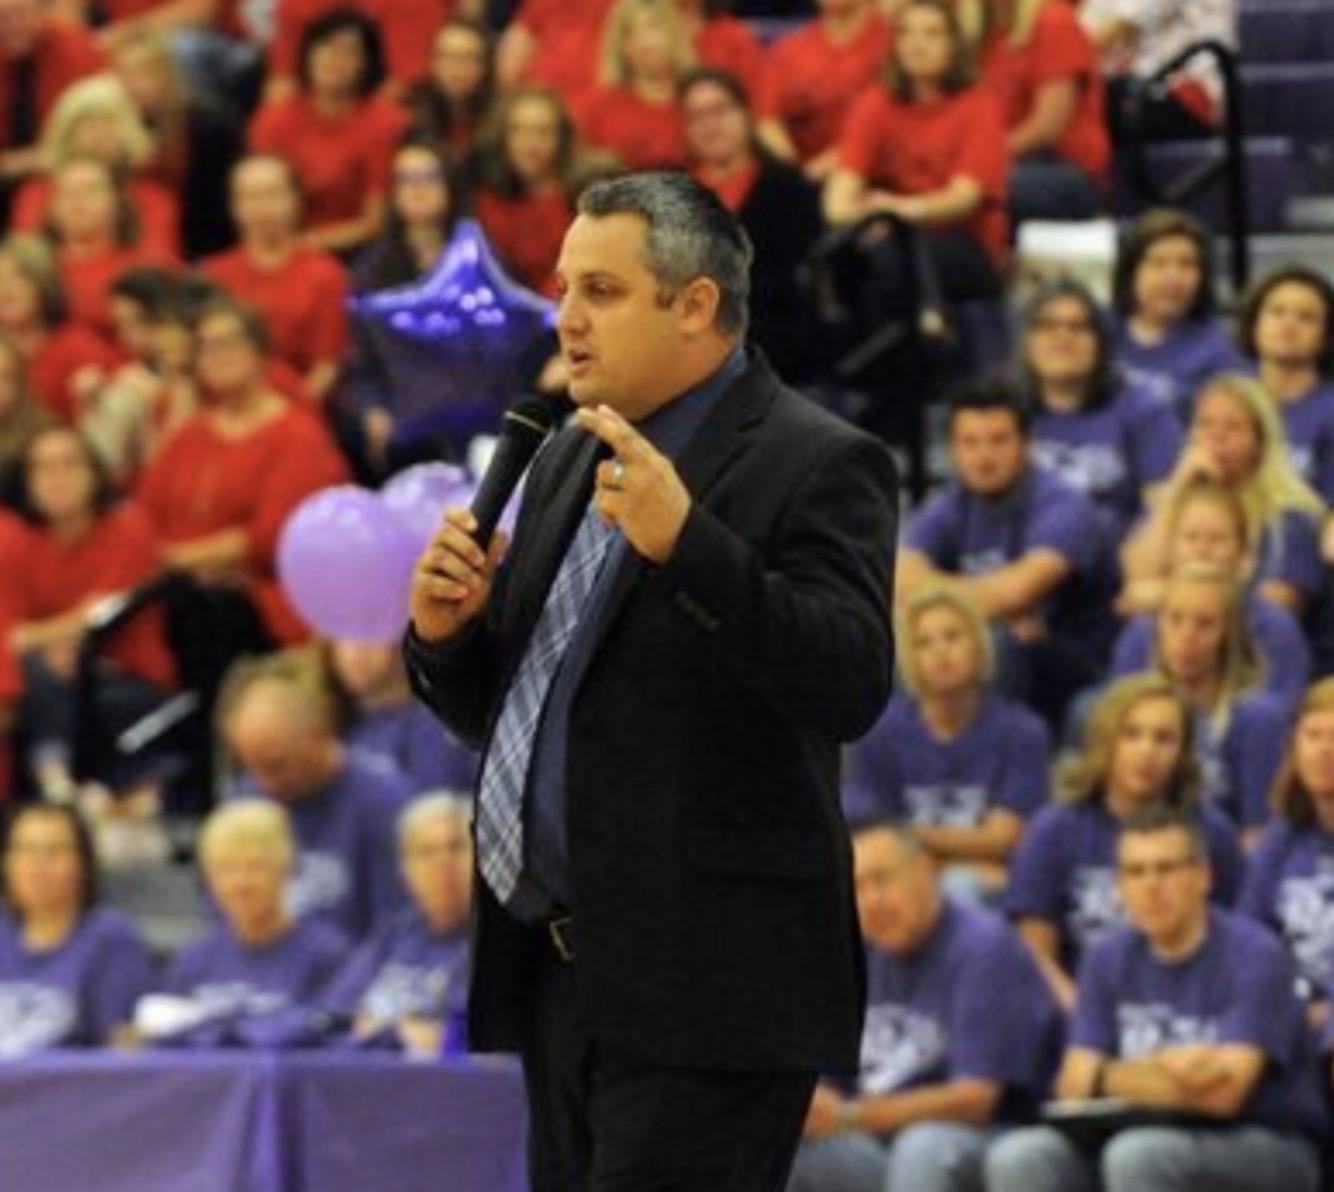 Guest Speaker Dustin Weaver